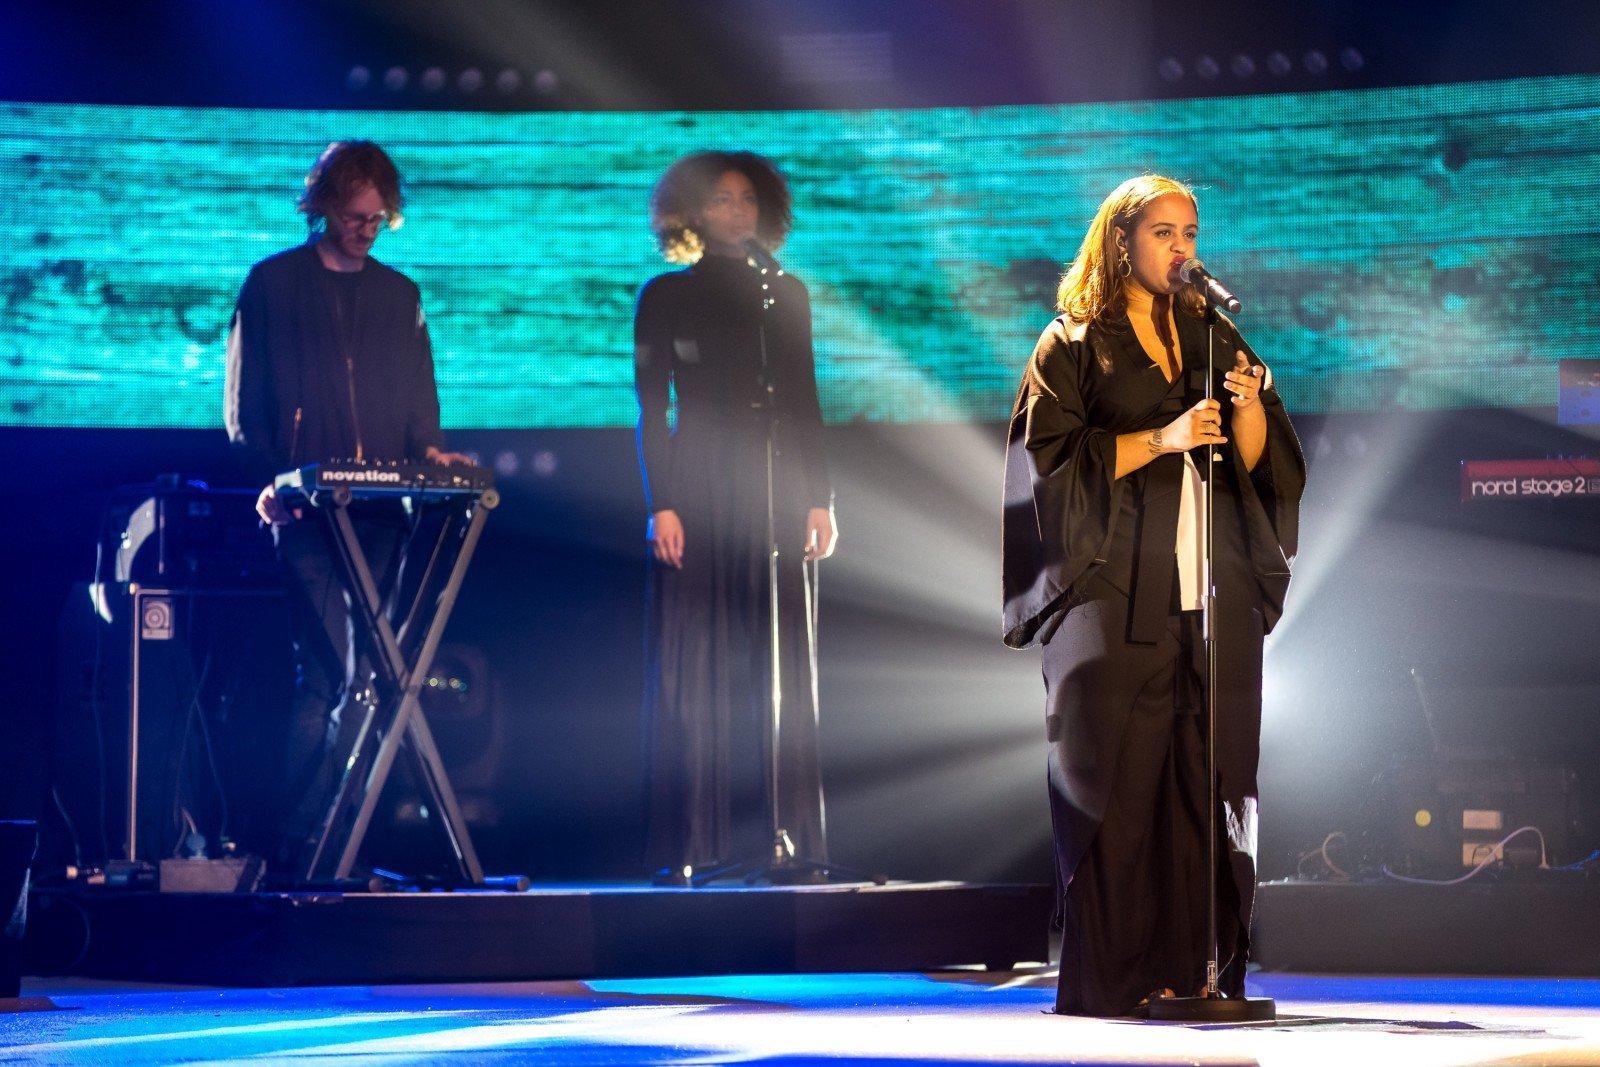 SeinaboSey_EBBA_JornBaars_20160113_EBBA Awards_Show_042